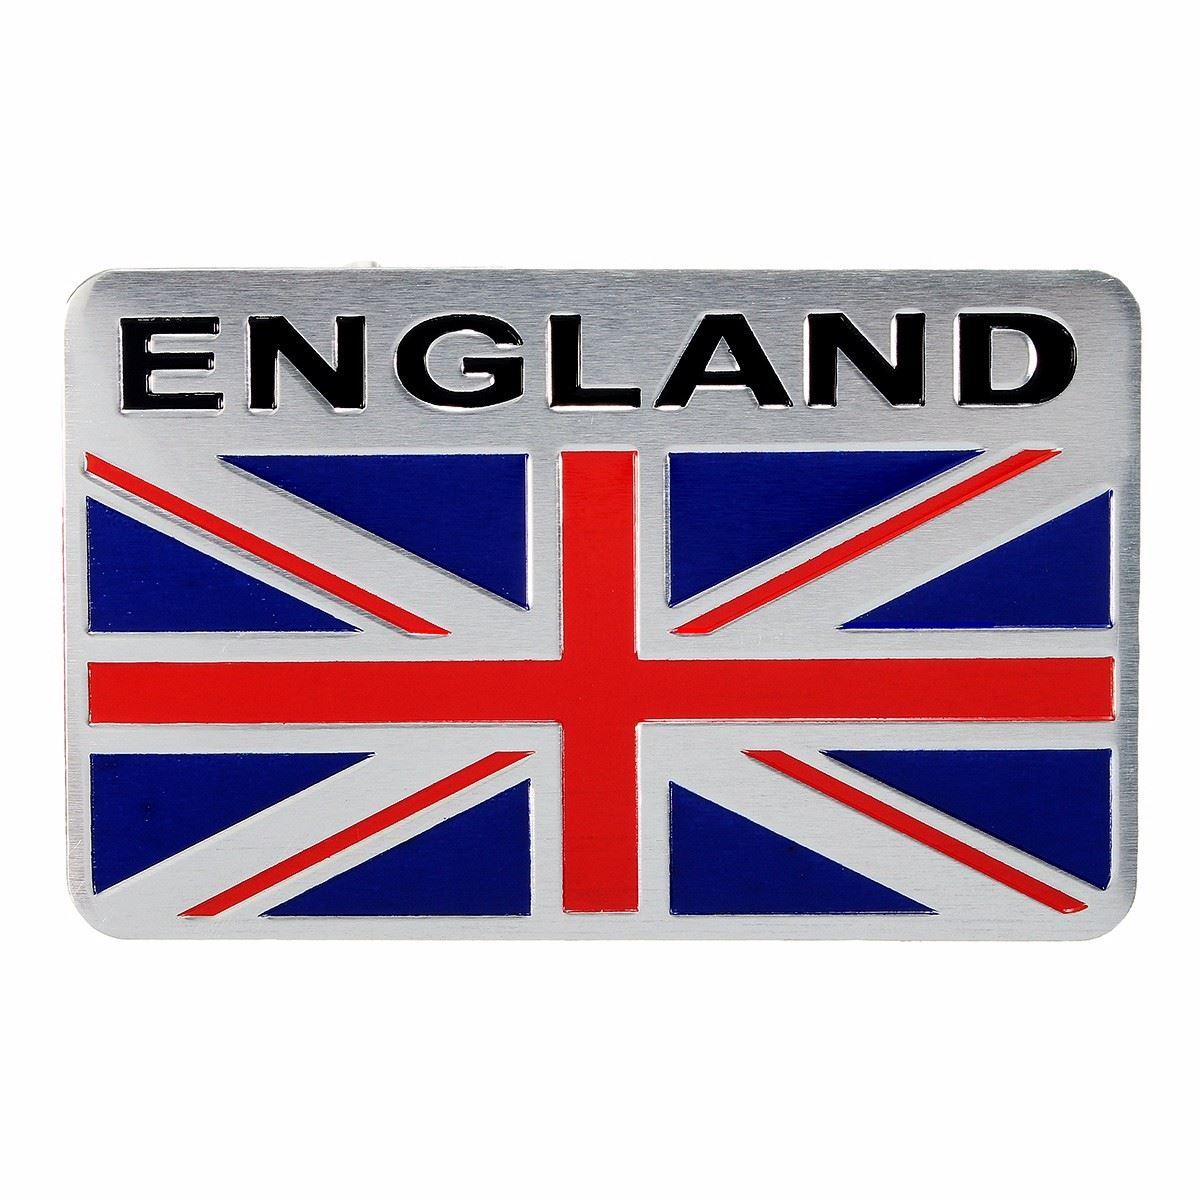 Aluminium Alloy Silver GB England UK Flag Emblem Badge Decal Decor Sticker For Car Truck Auto